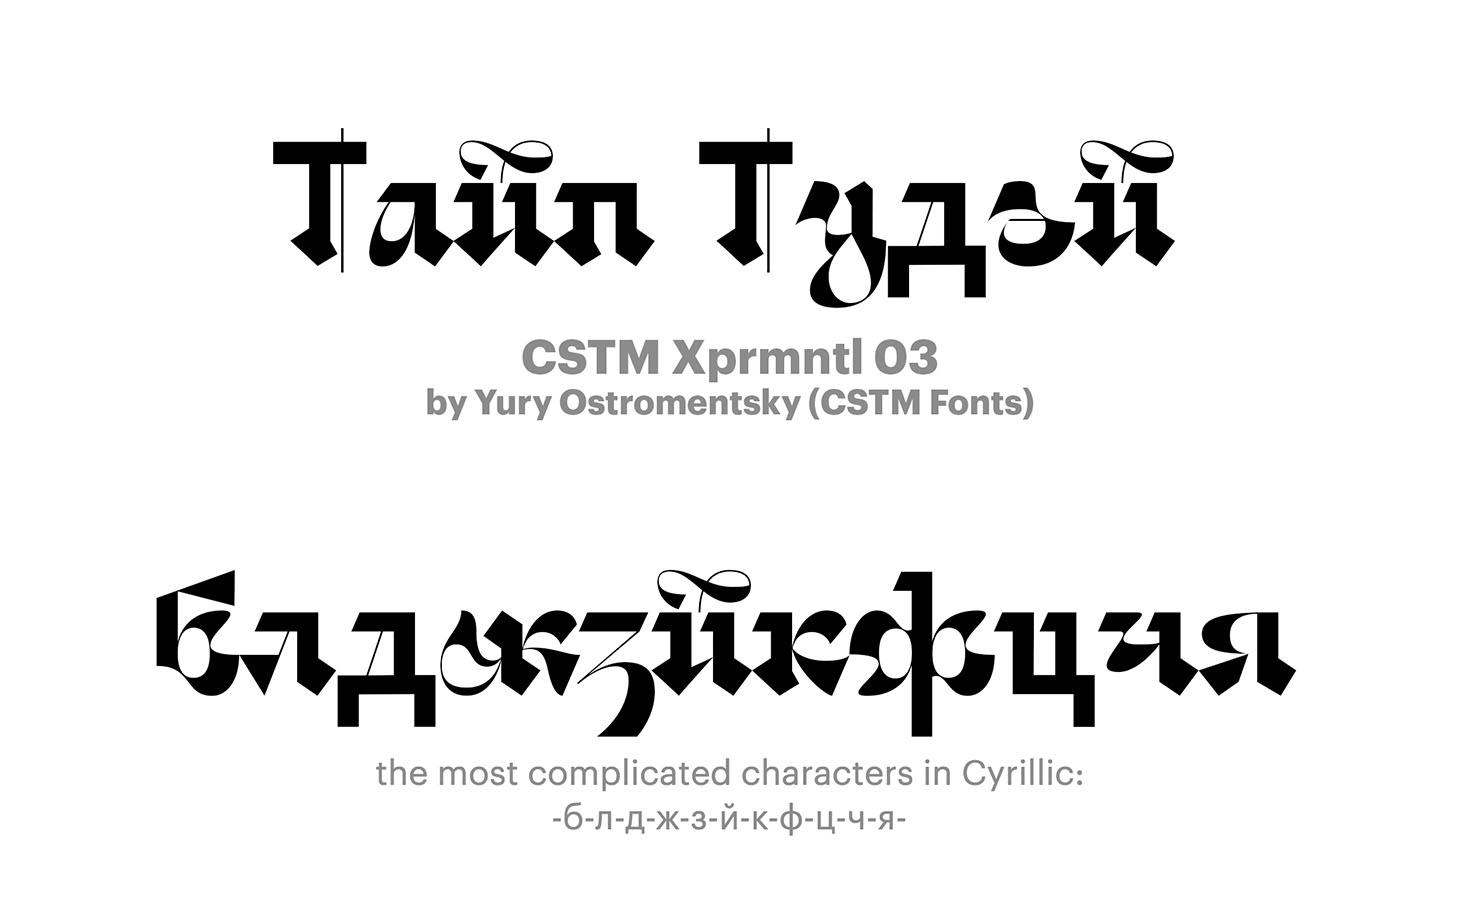 CSTM-Xprmntl-03